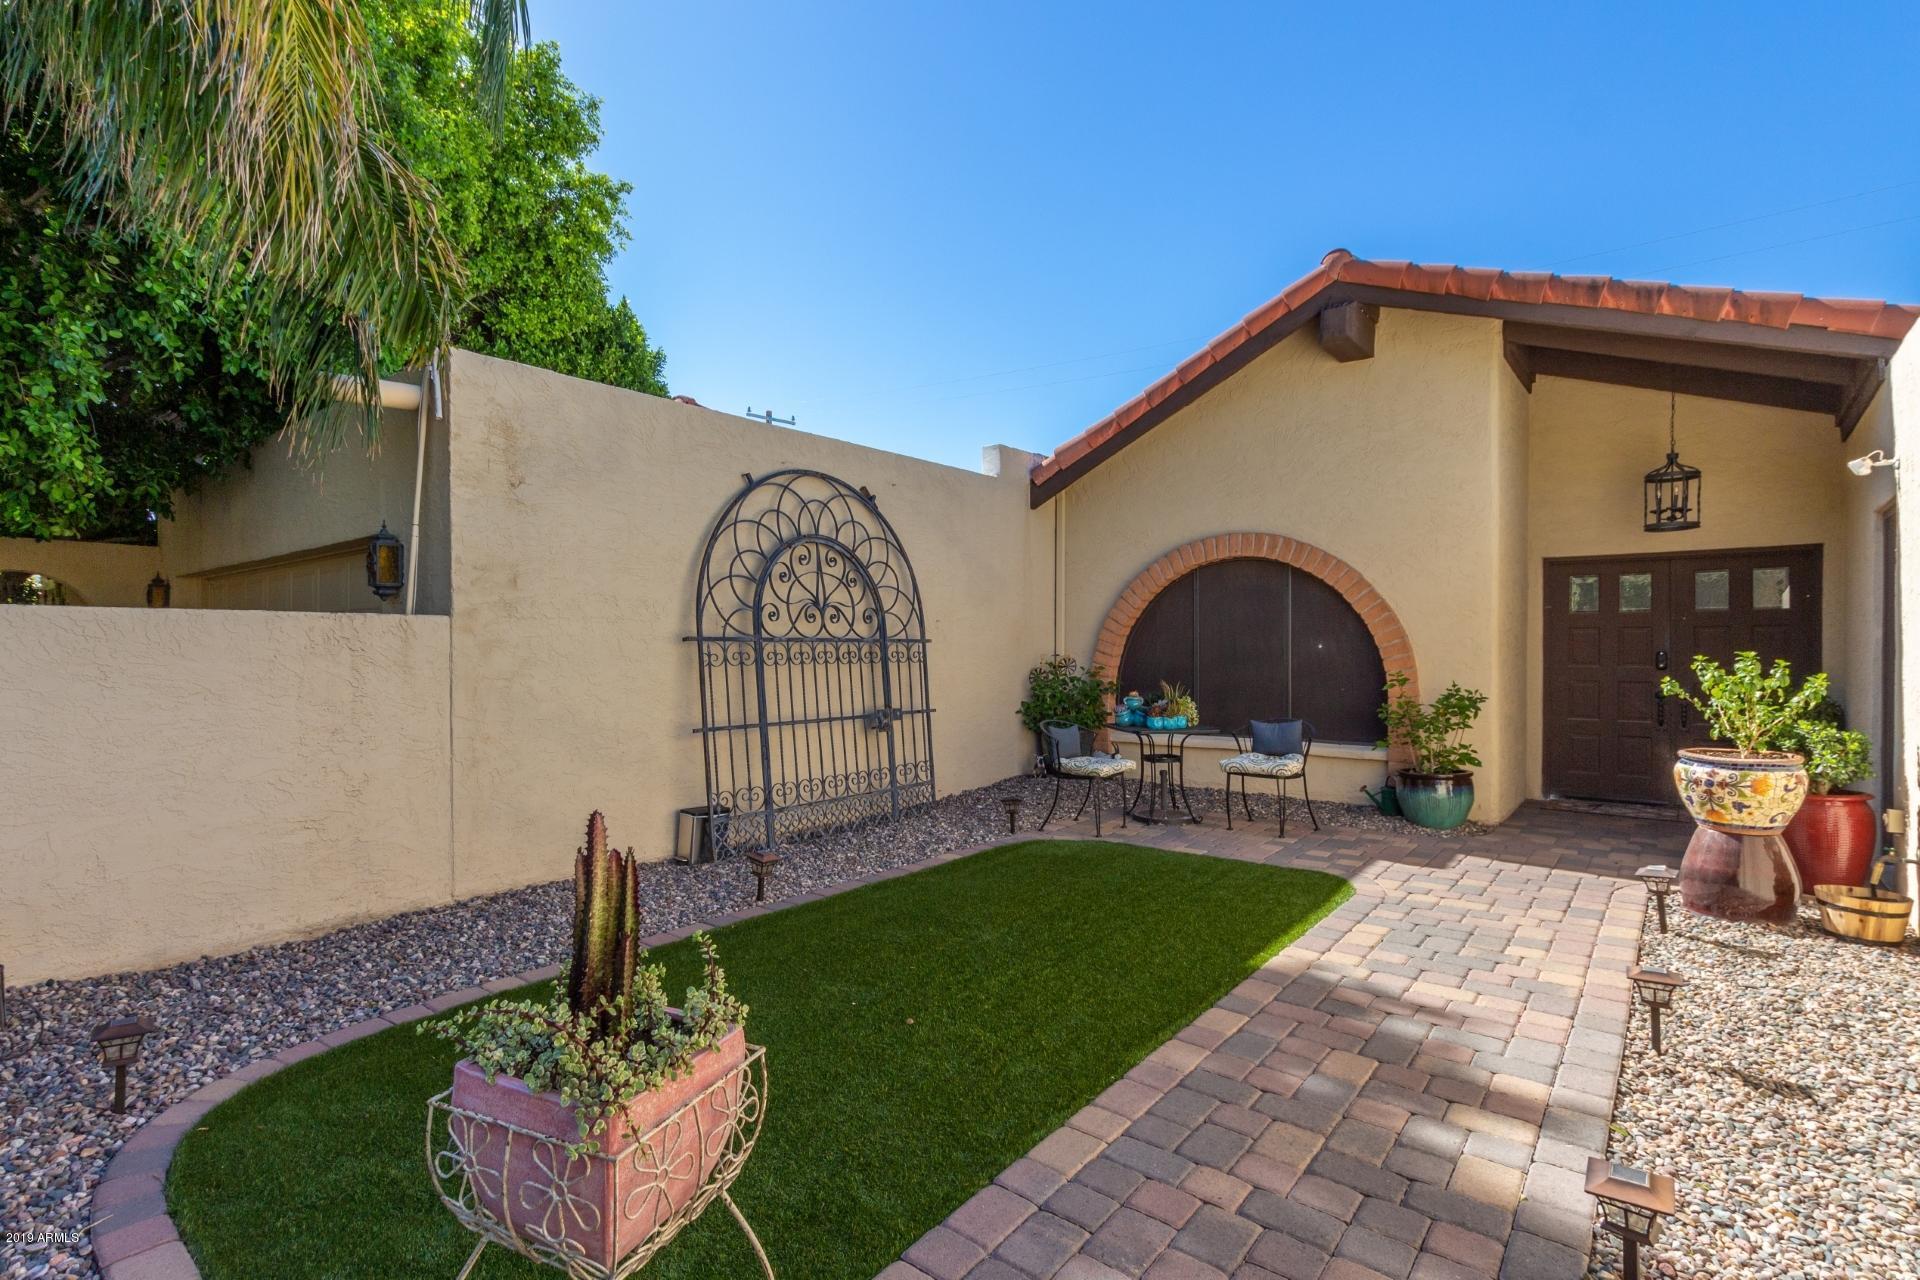 Photo for 729 E Tuckey Lane, Phoenix, AZ 85014 (MLS # 5916554)